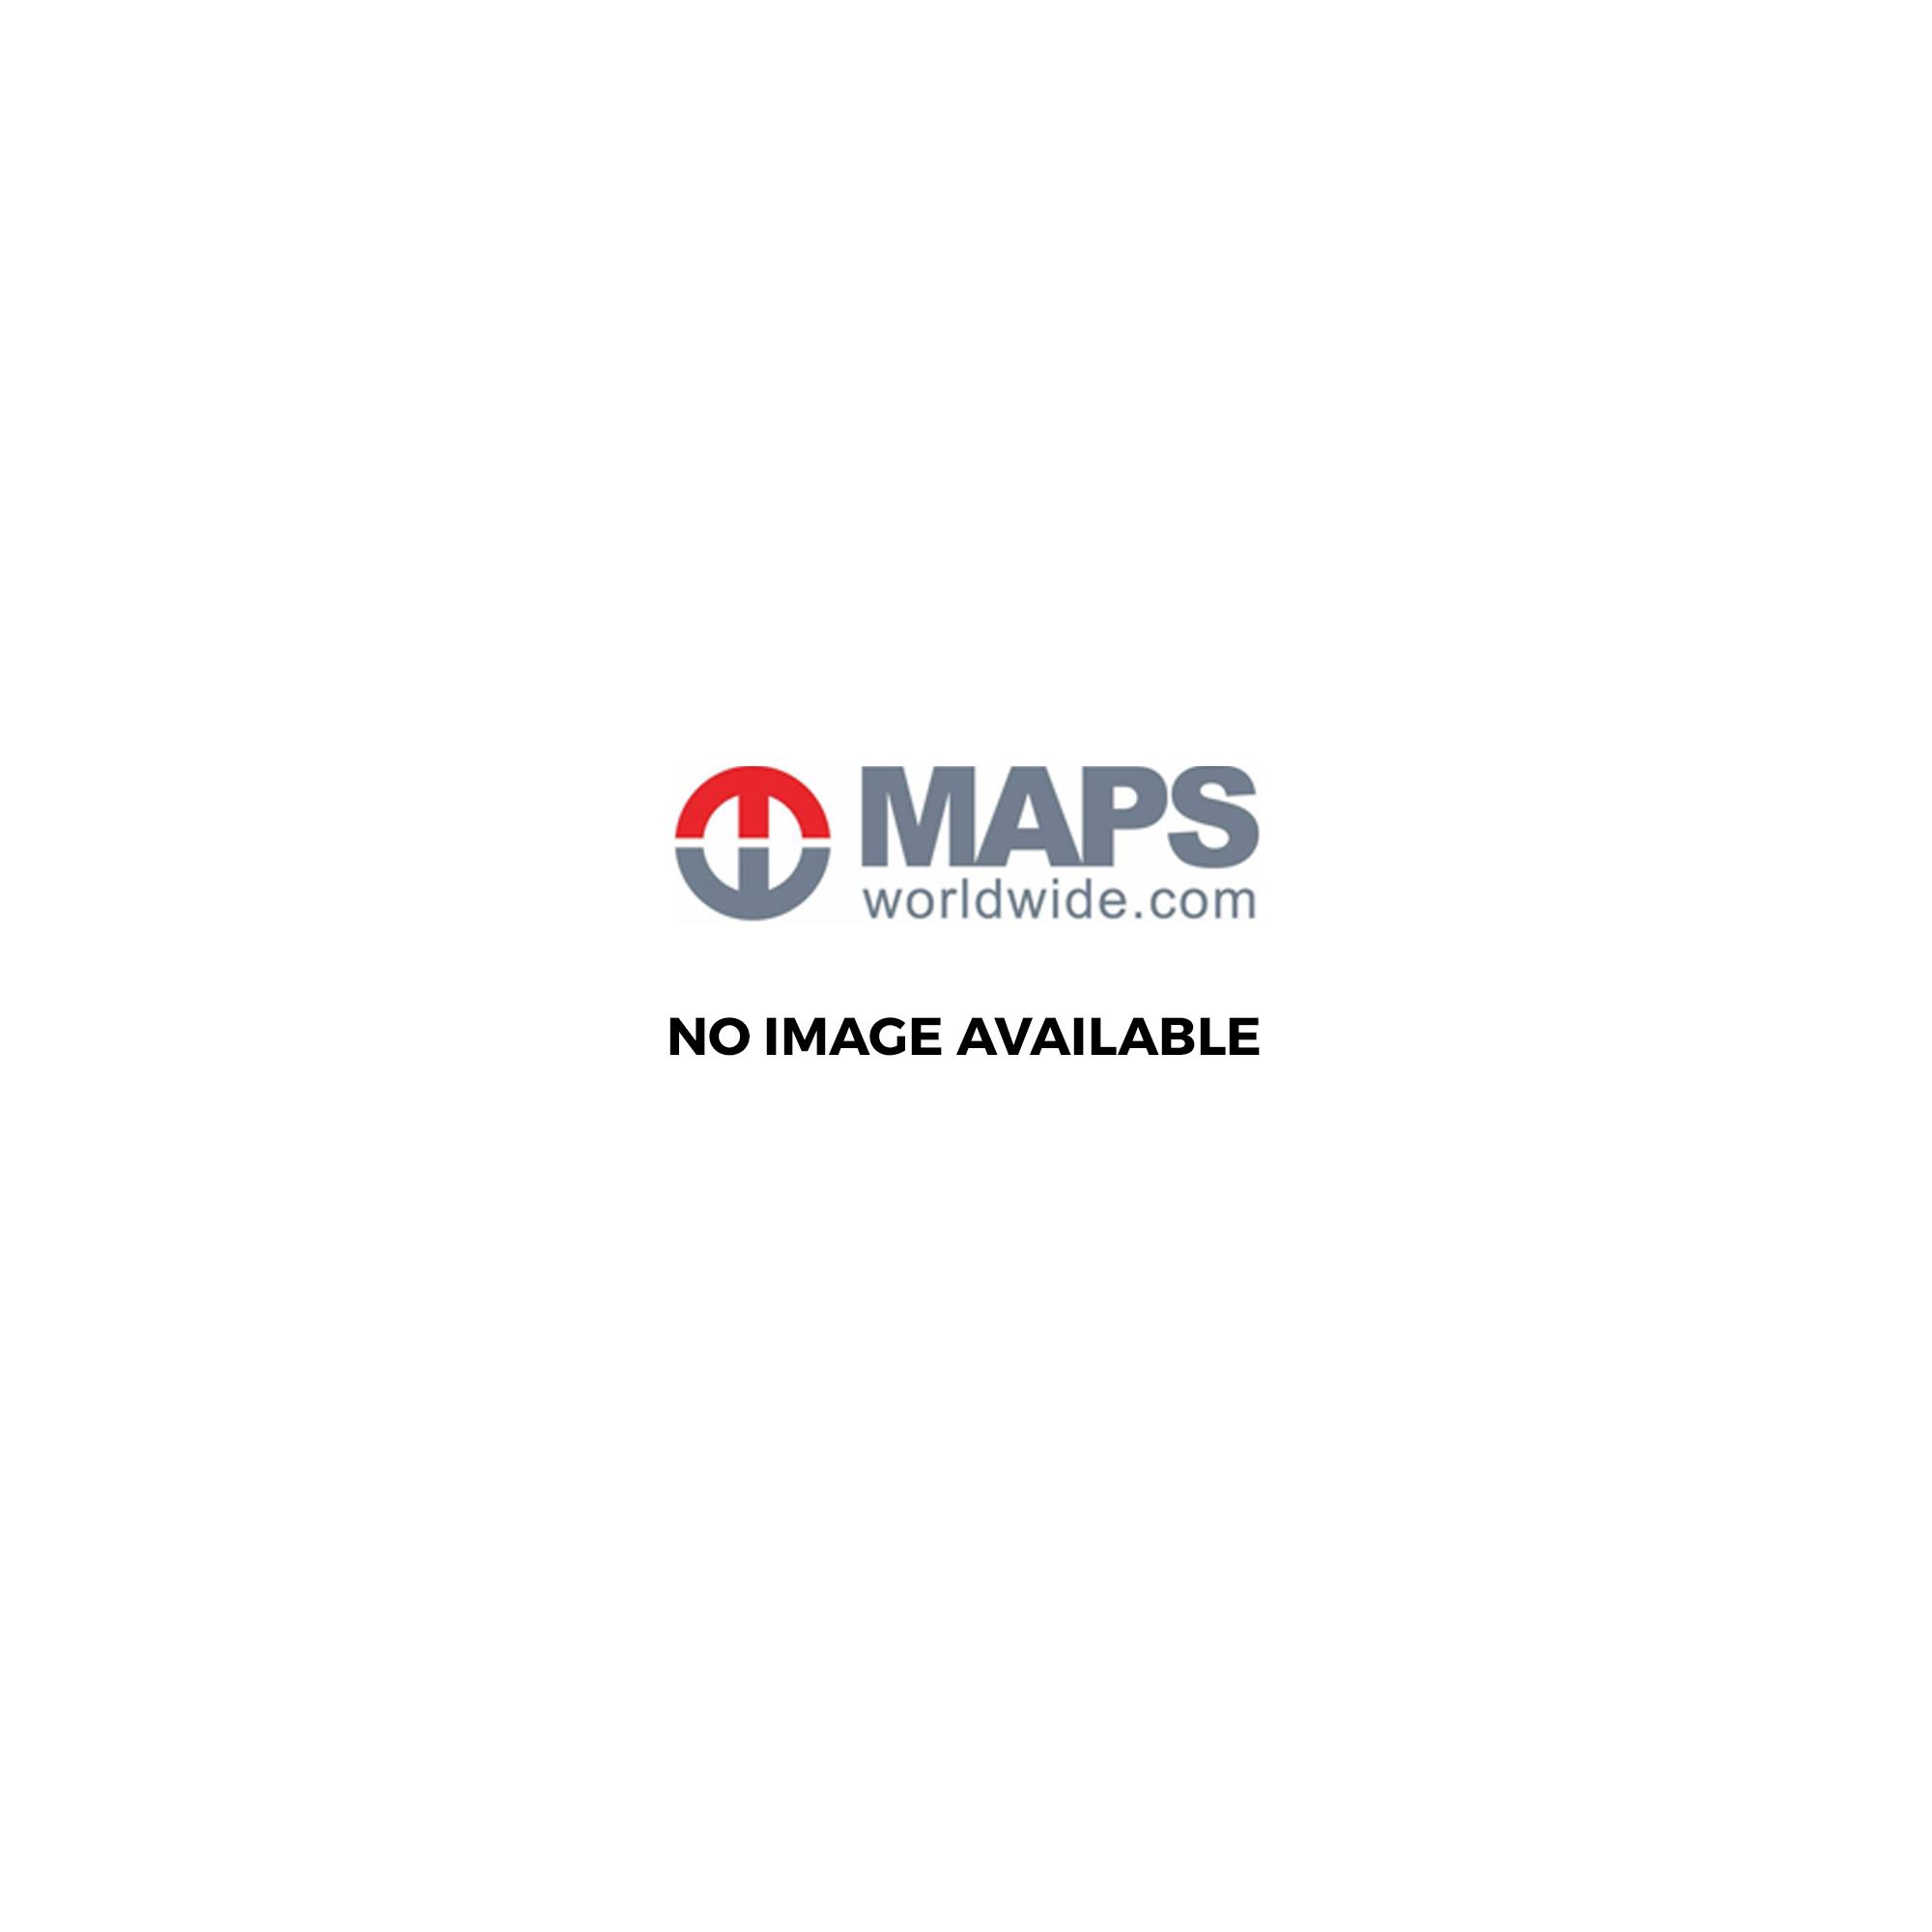 3314T Andermatt Europe from Maps Worldwide UK